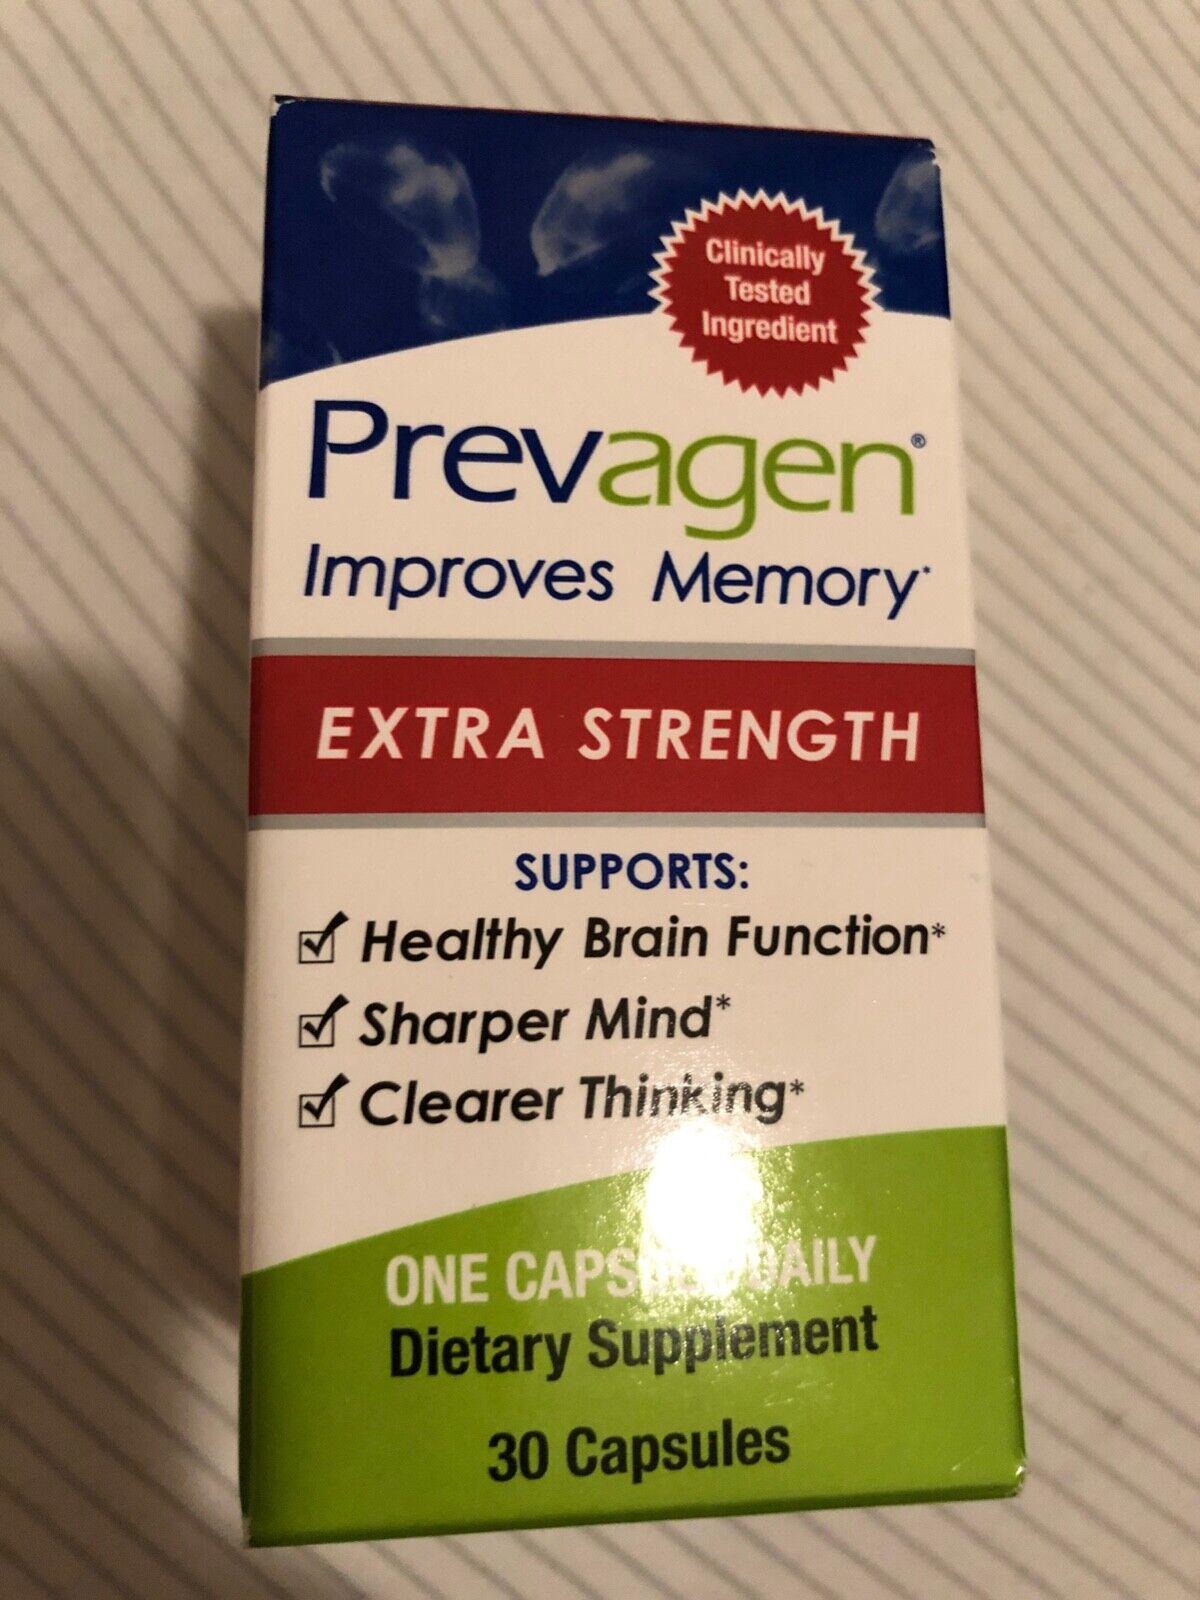 Prevagen Extra Strength Improves Memory Capsules - 30 Coun